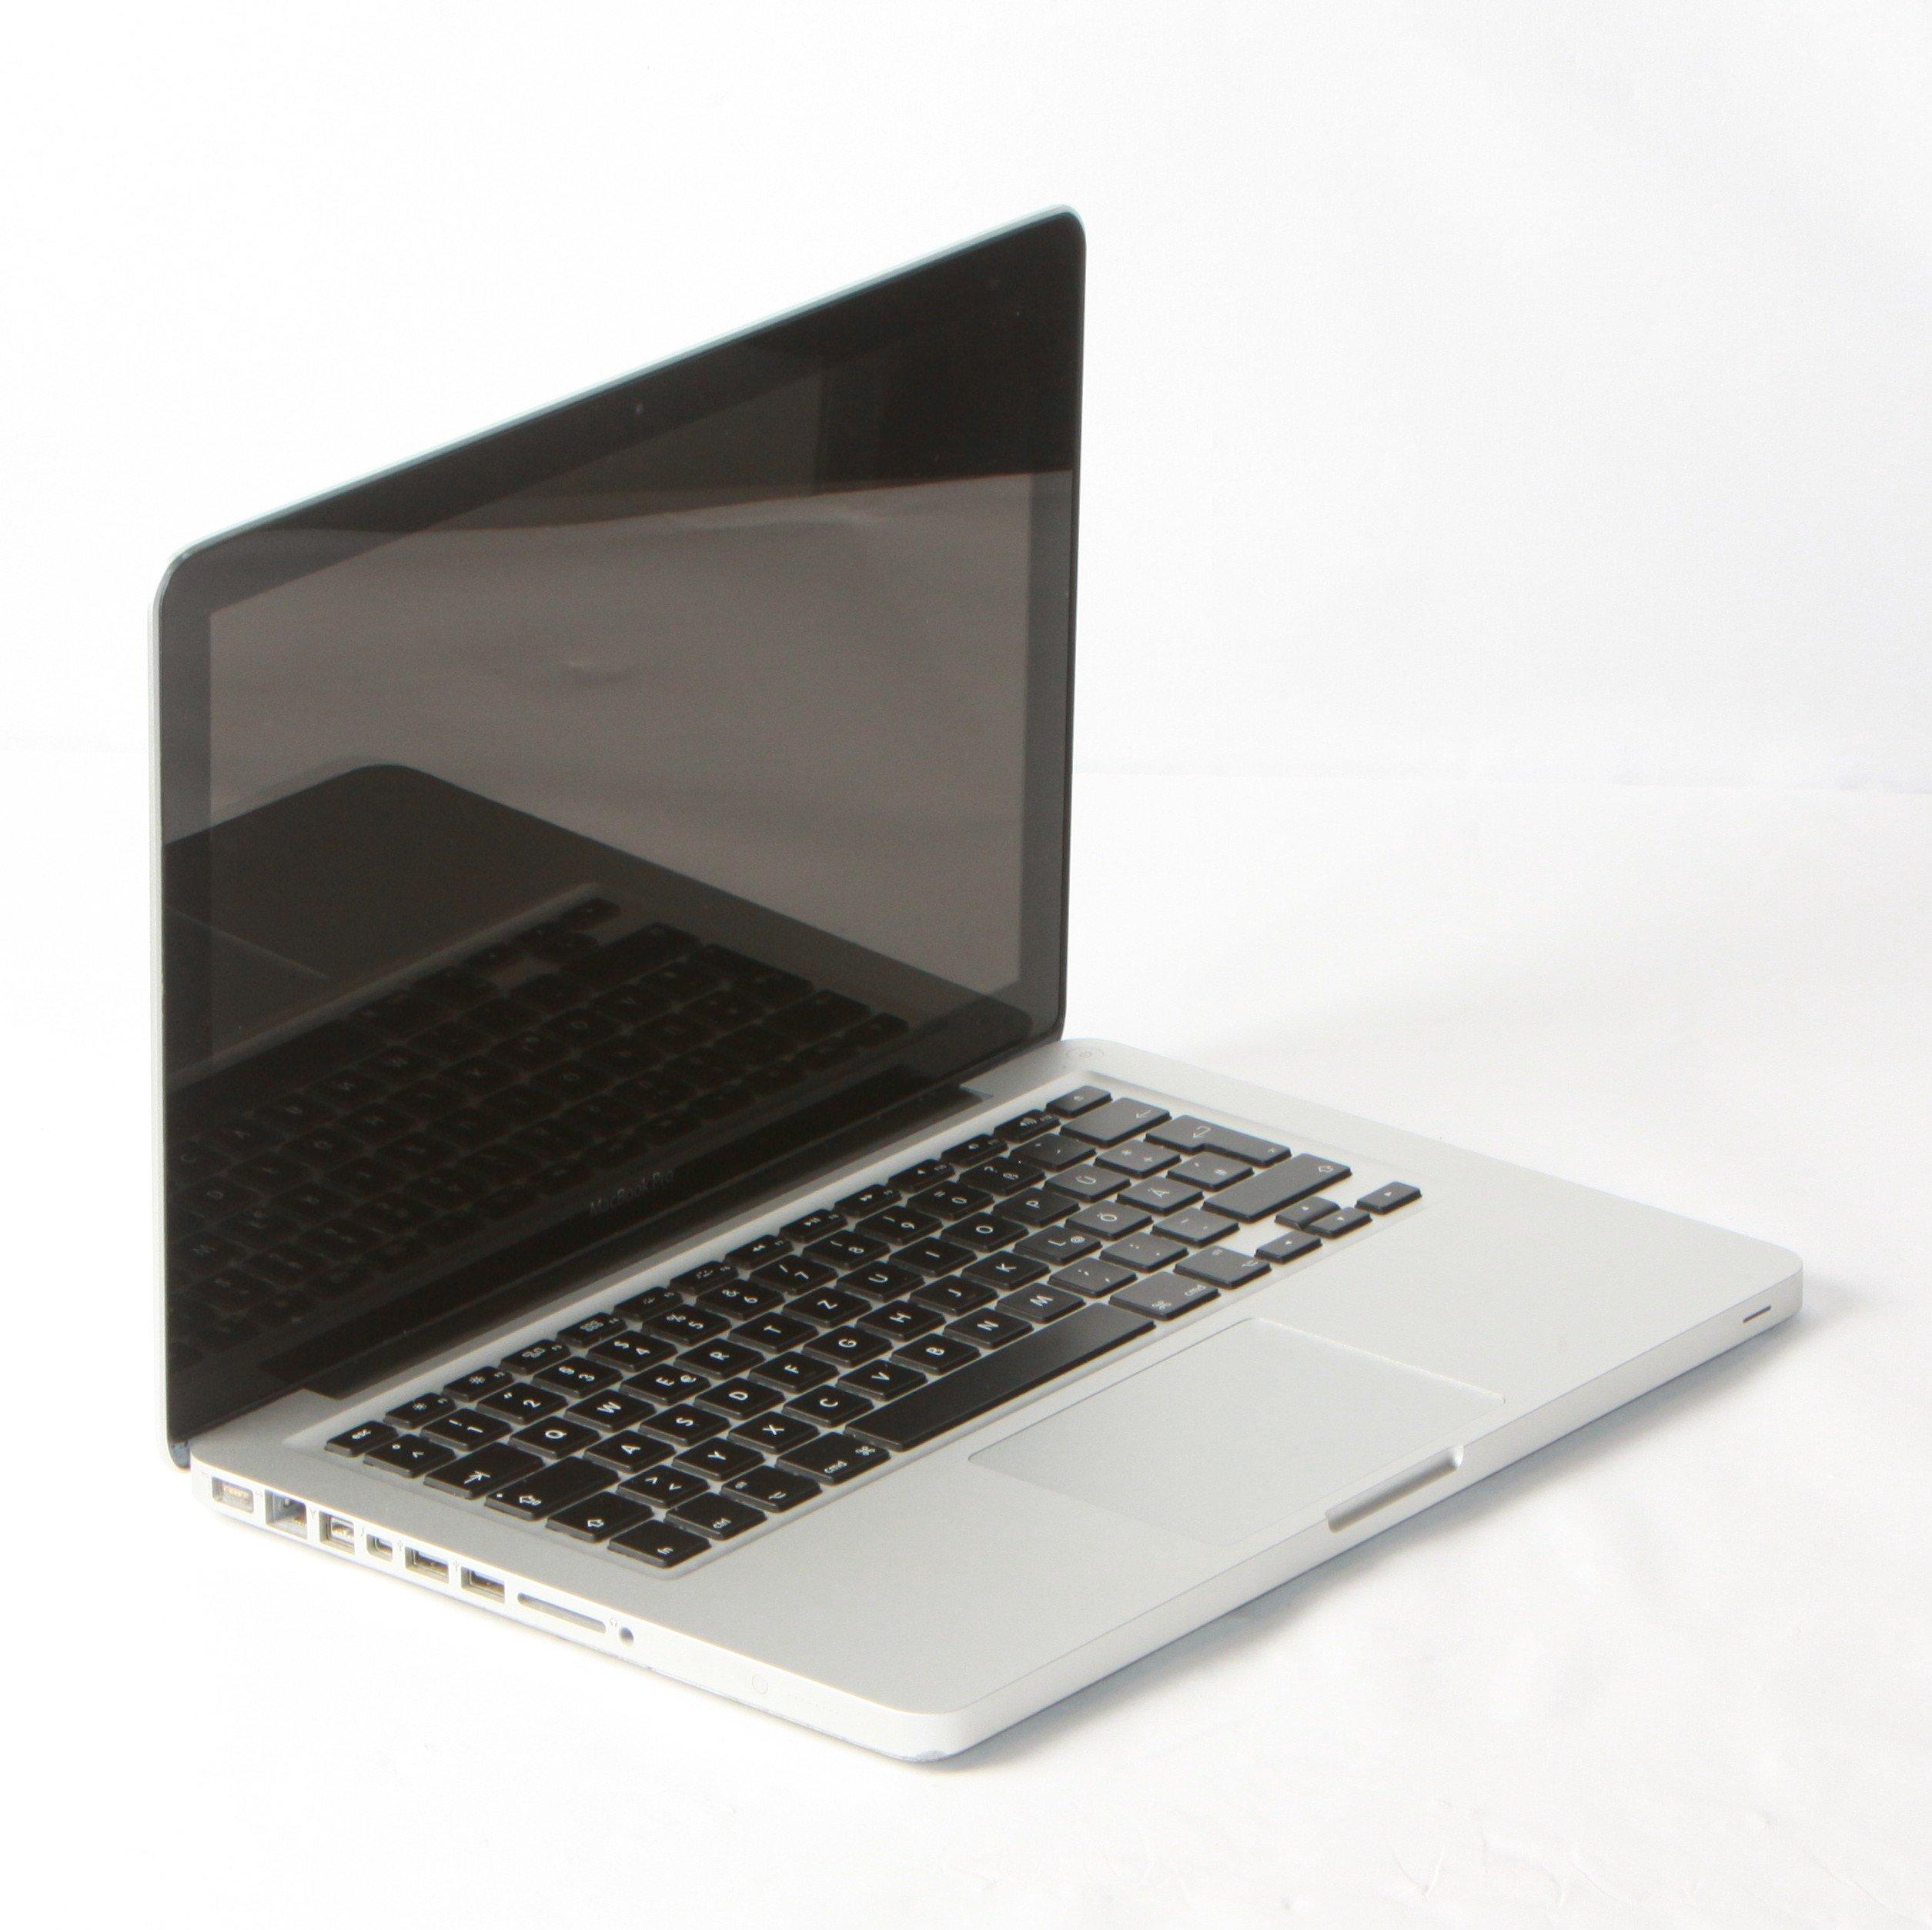 apple macbook pro a1278 md313da front sadaghian it dienstleistungen. Black Bedroom Furniture Sets. Home Design Ideas